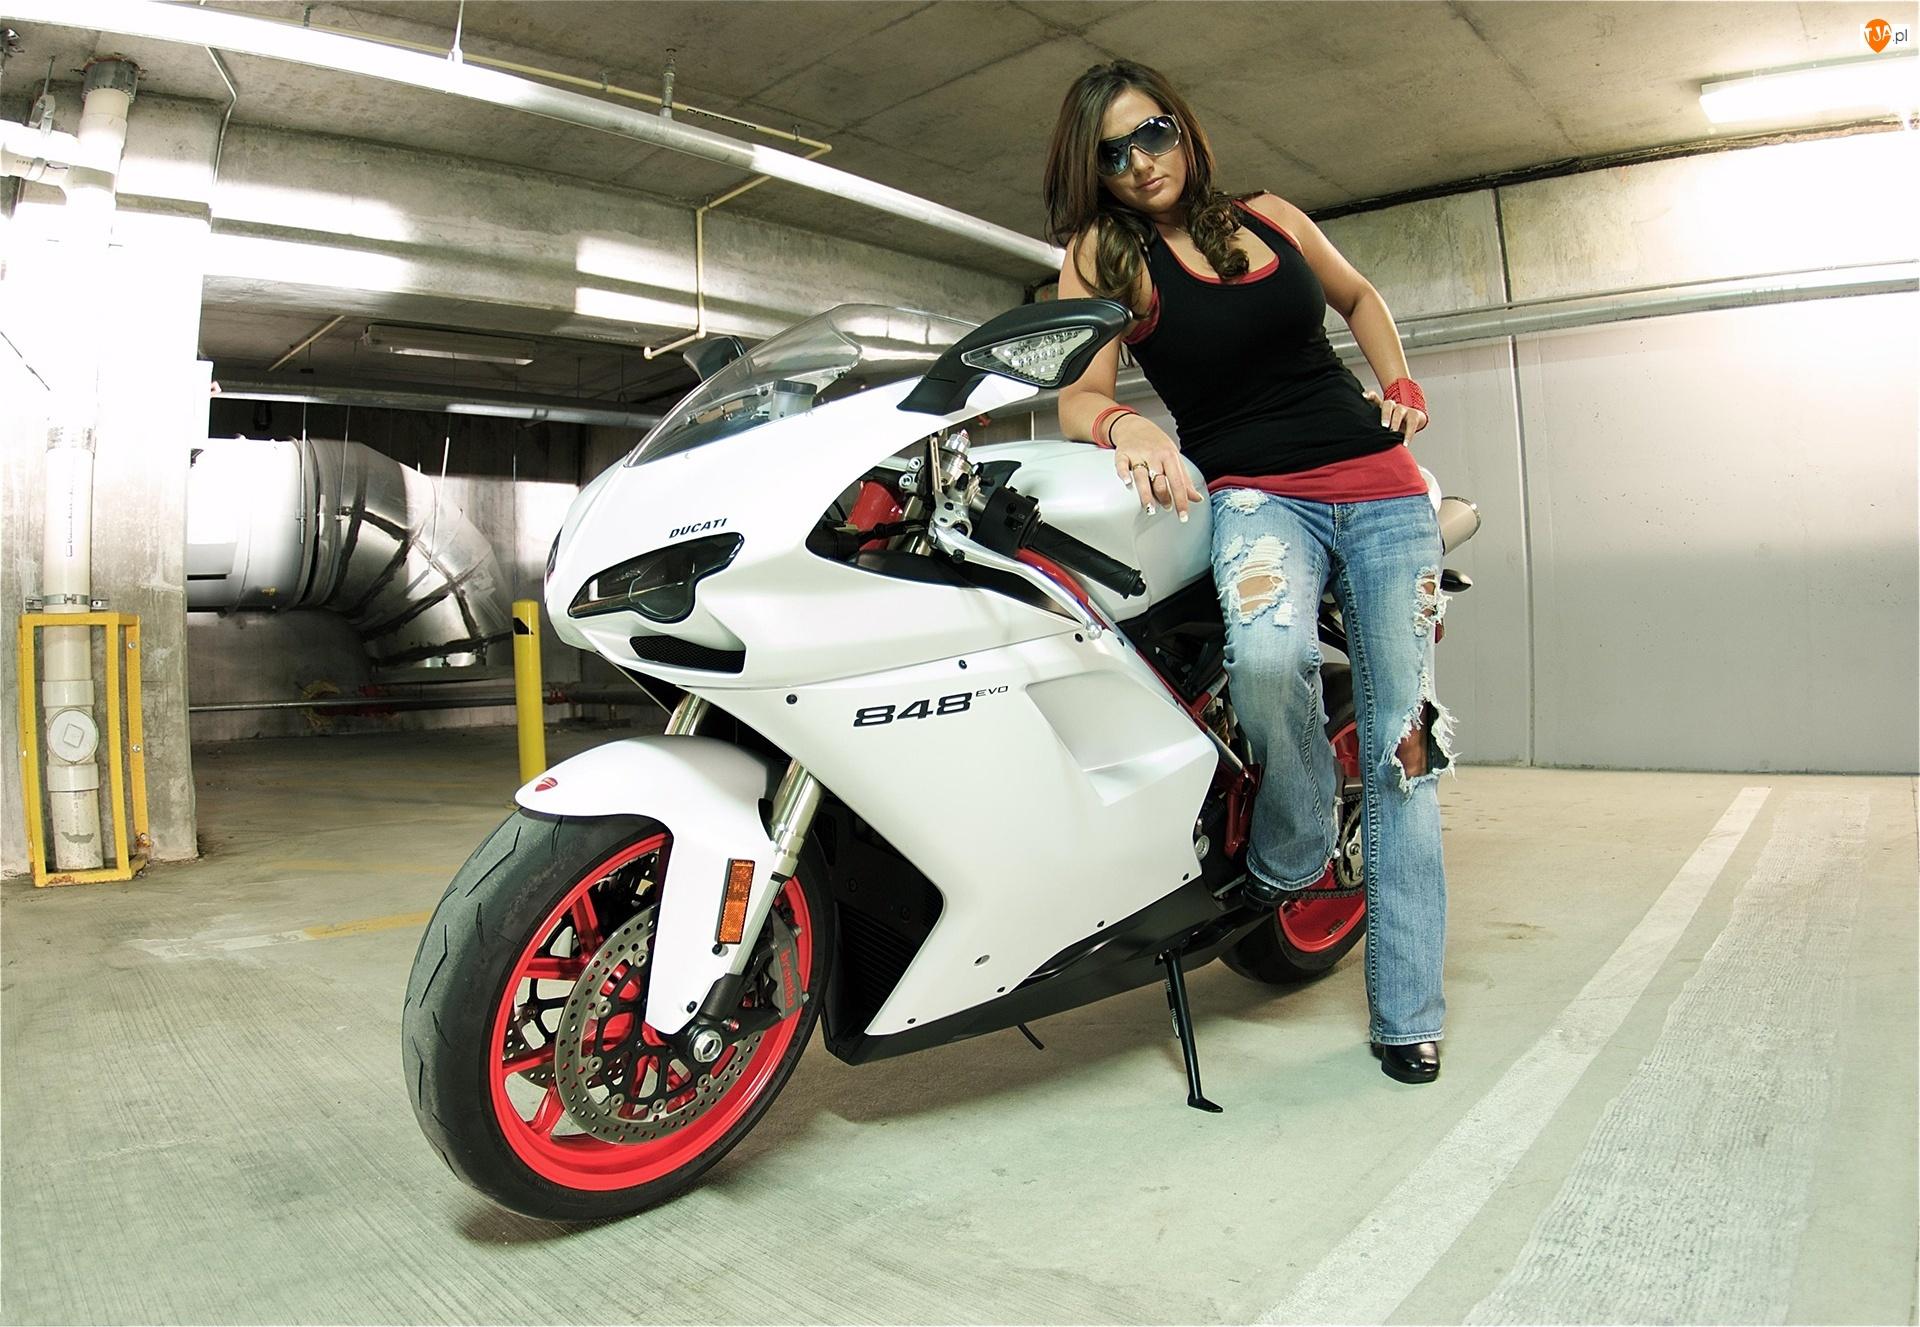 Okulary, Motocykl Ducati 848, Kobieta